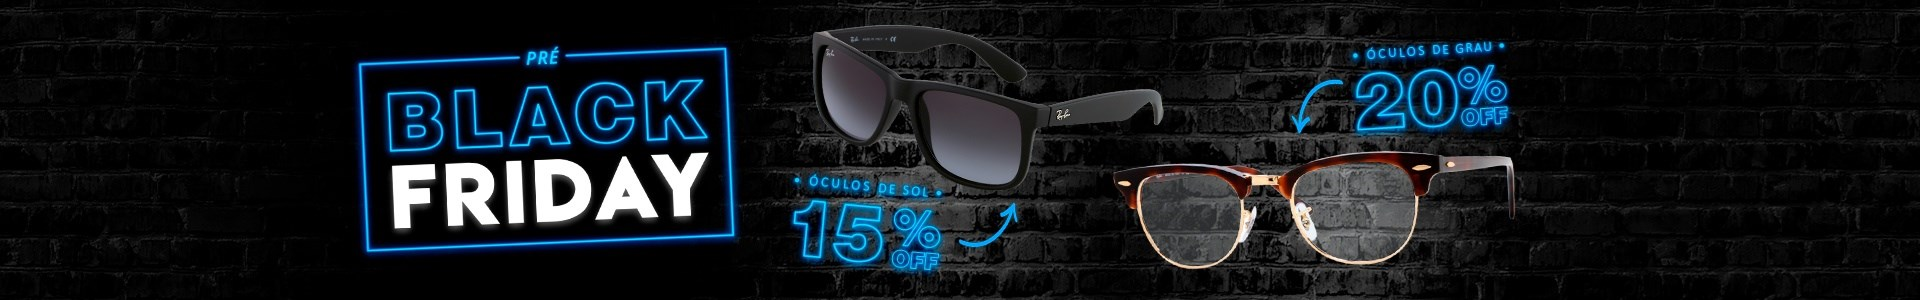 Pre Black Friday NewLentes - Oculos